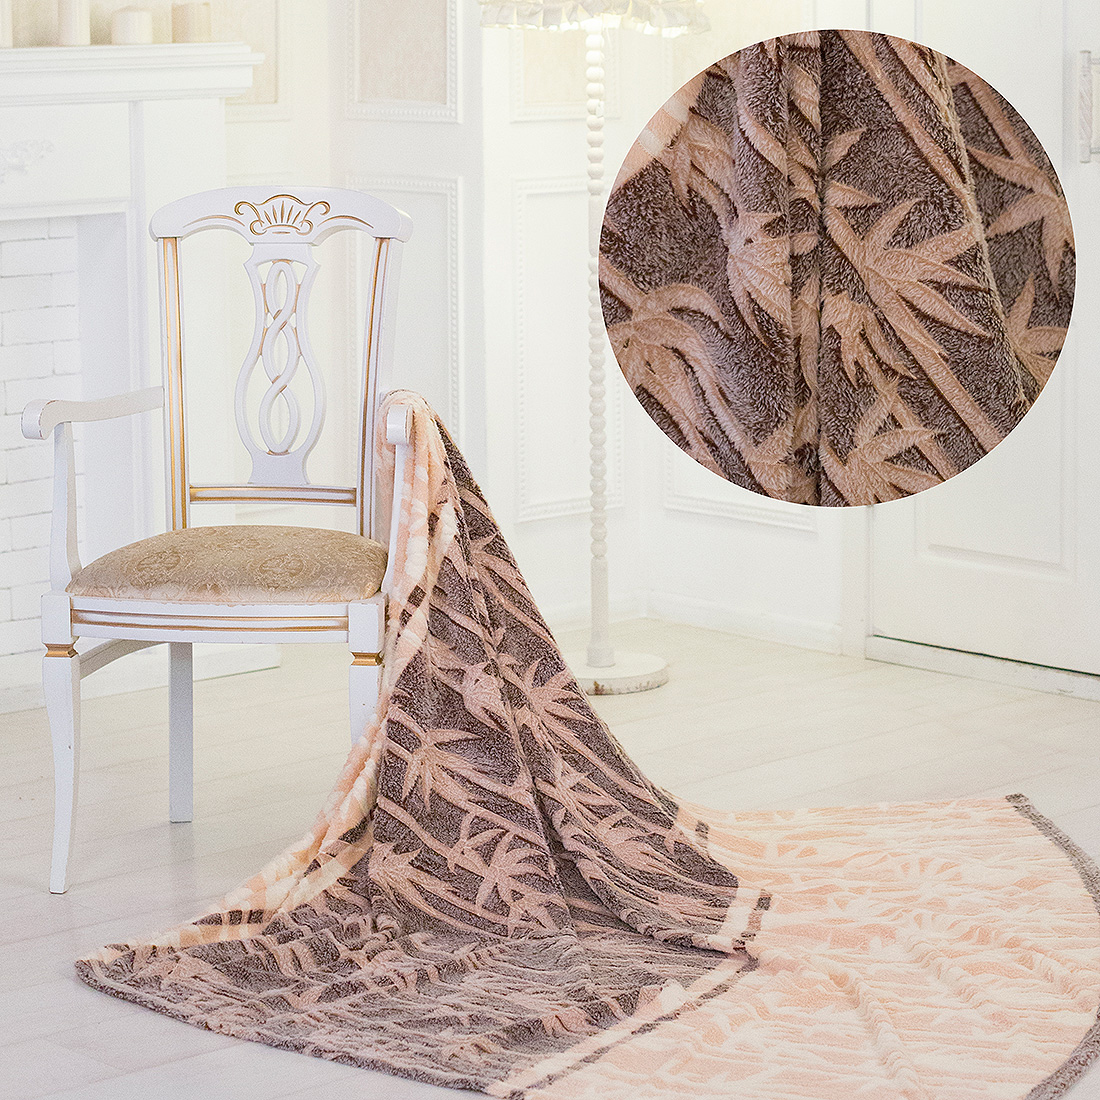 Плед Eleganta Плед Коричневый Бамбук (180х200) eleganta eleganta фотошторы блюз